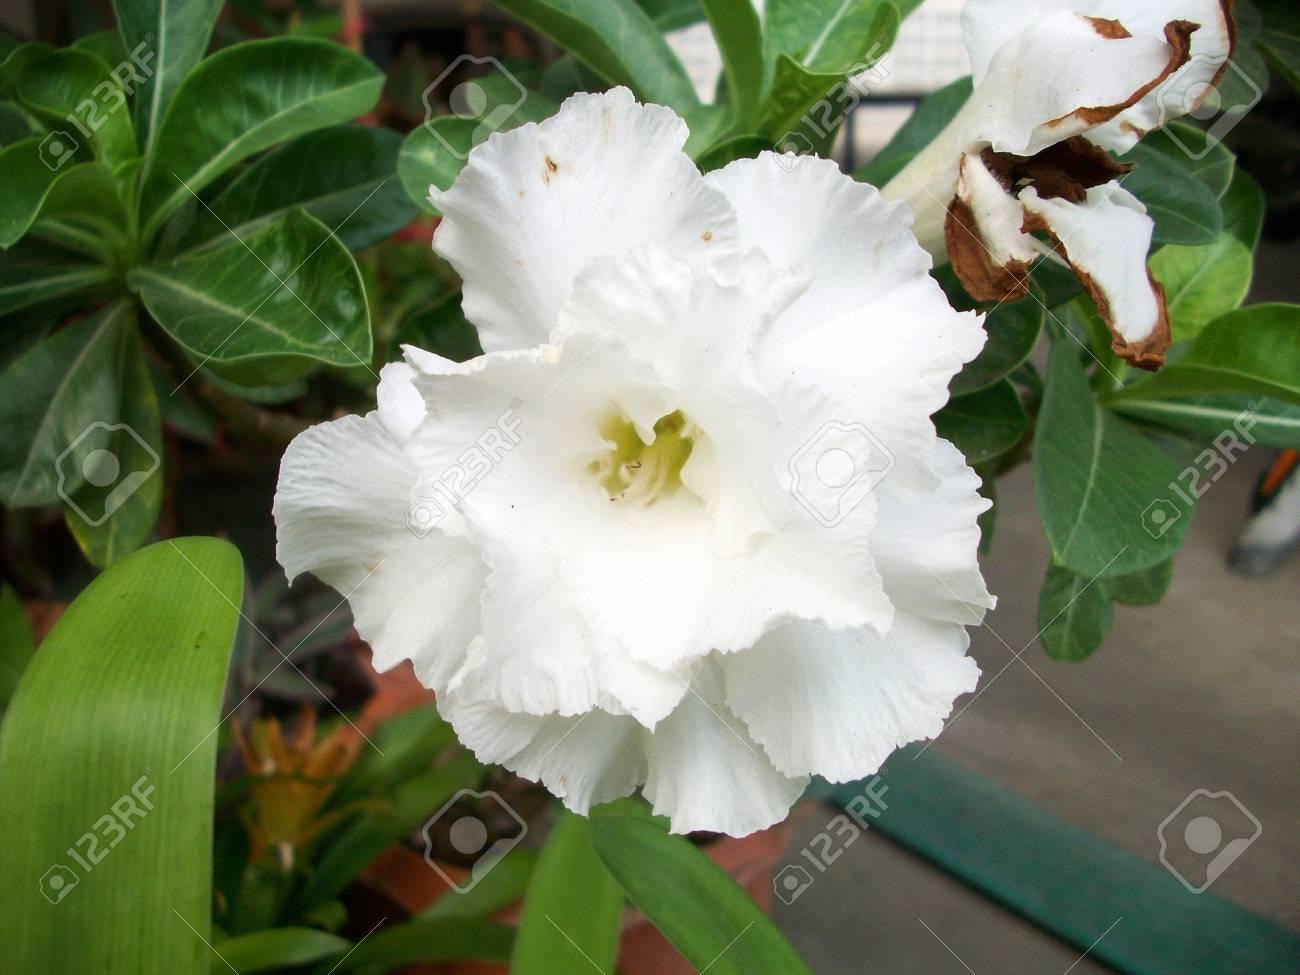 Impala lily adenium - white flowers Stock Photo - 26497922